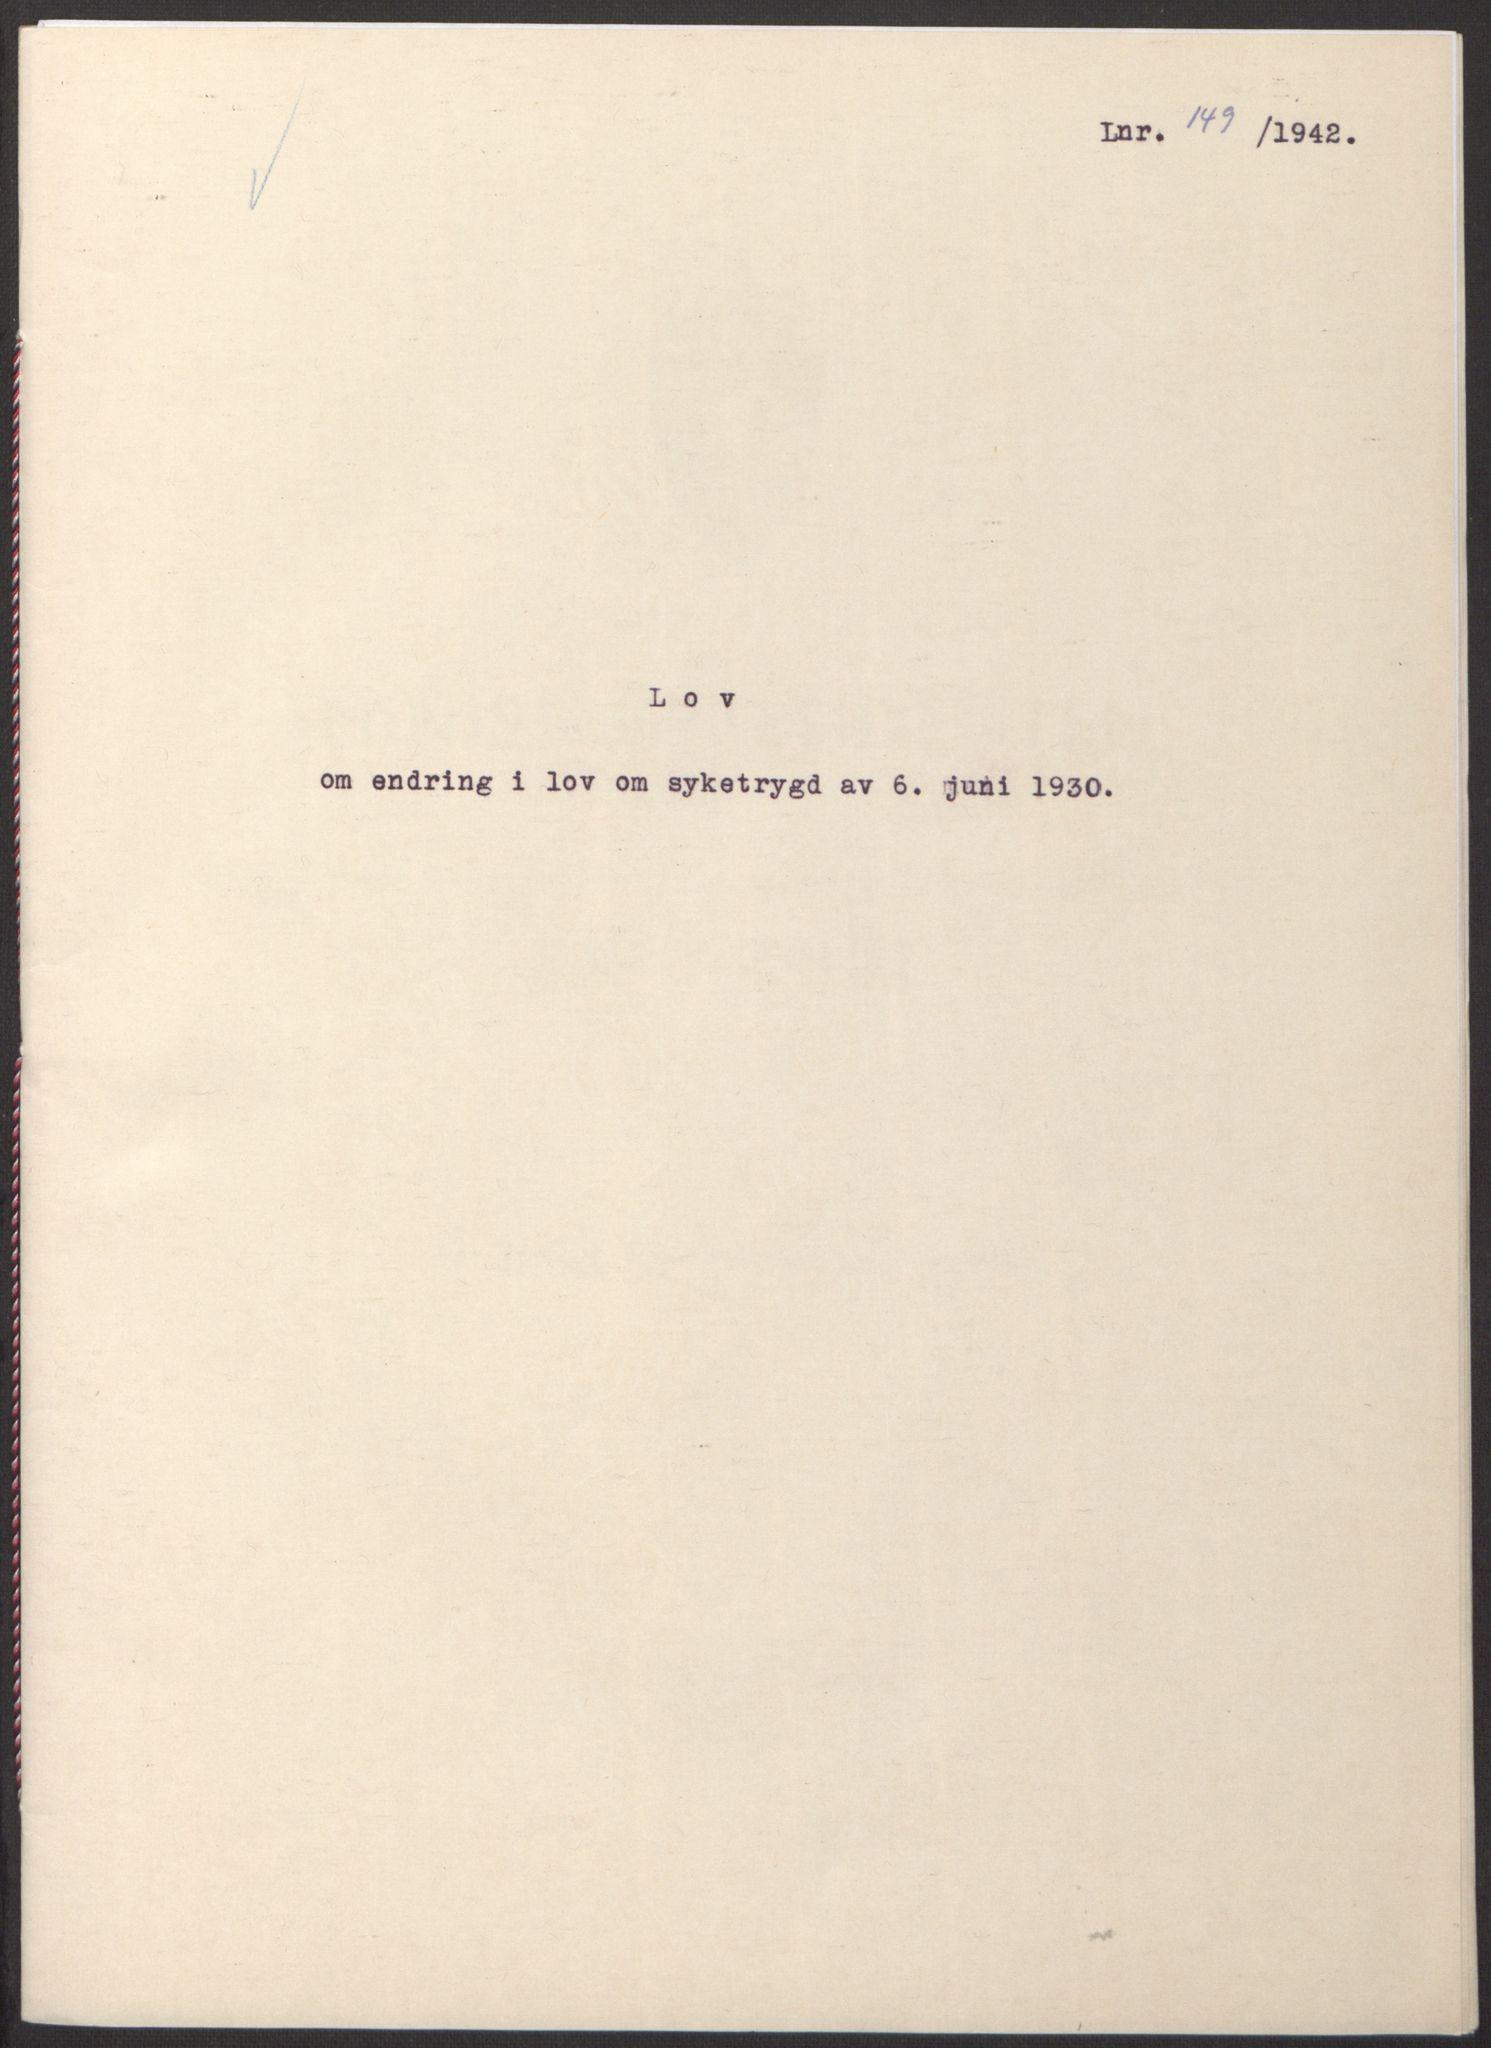 RA, NS-administrasjonen 1940-1945 (Statsrådsekretariatet, de kommisariske statsråder mm), D/Db/L0098: Lover II, 1942, s. upaginert